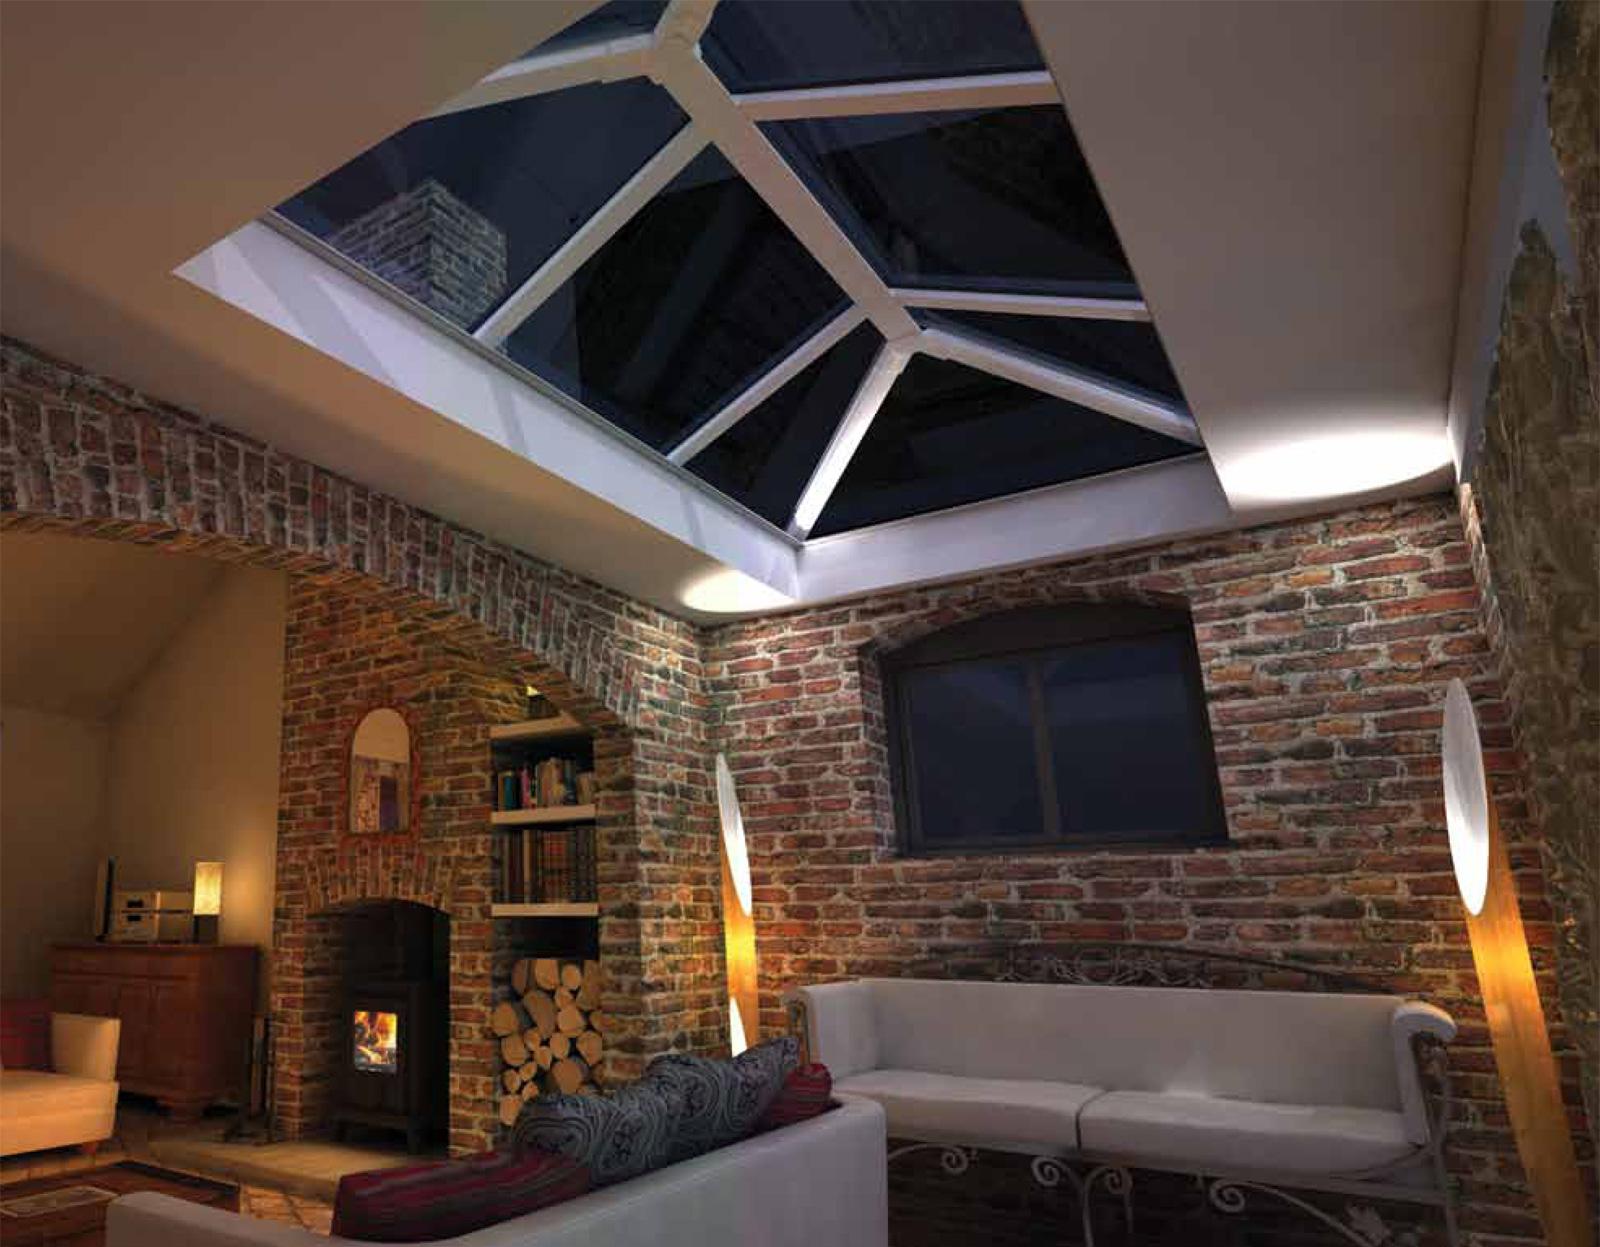 Skypod living room